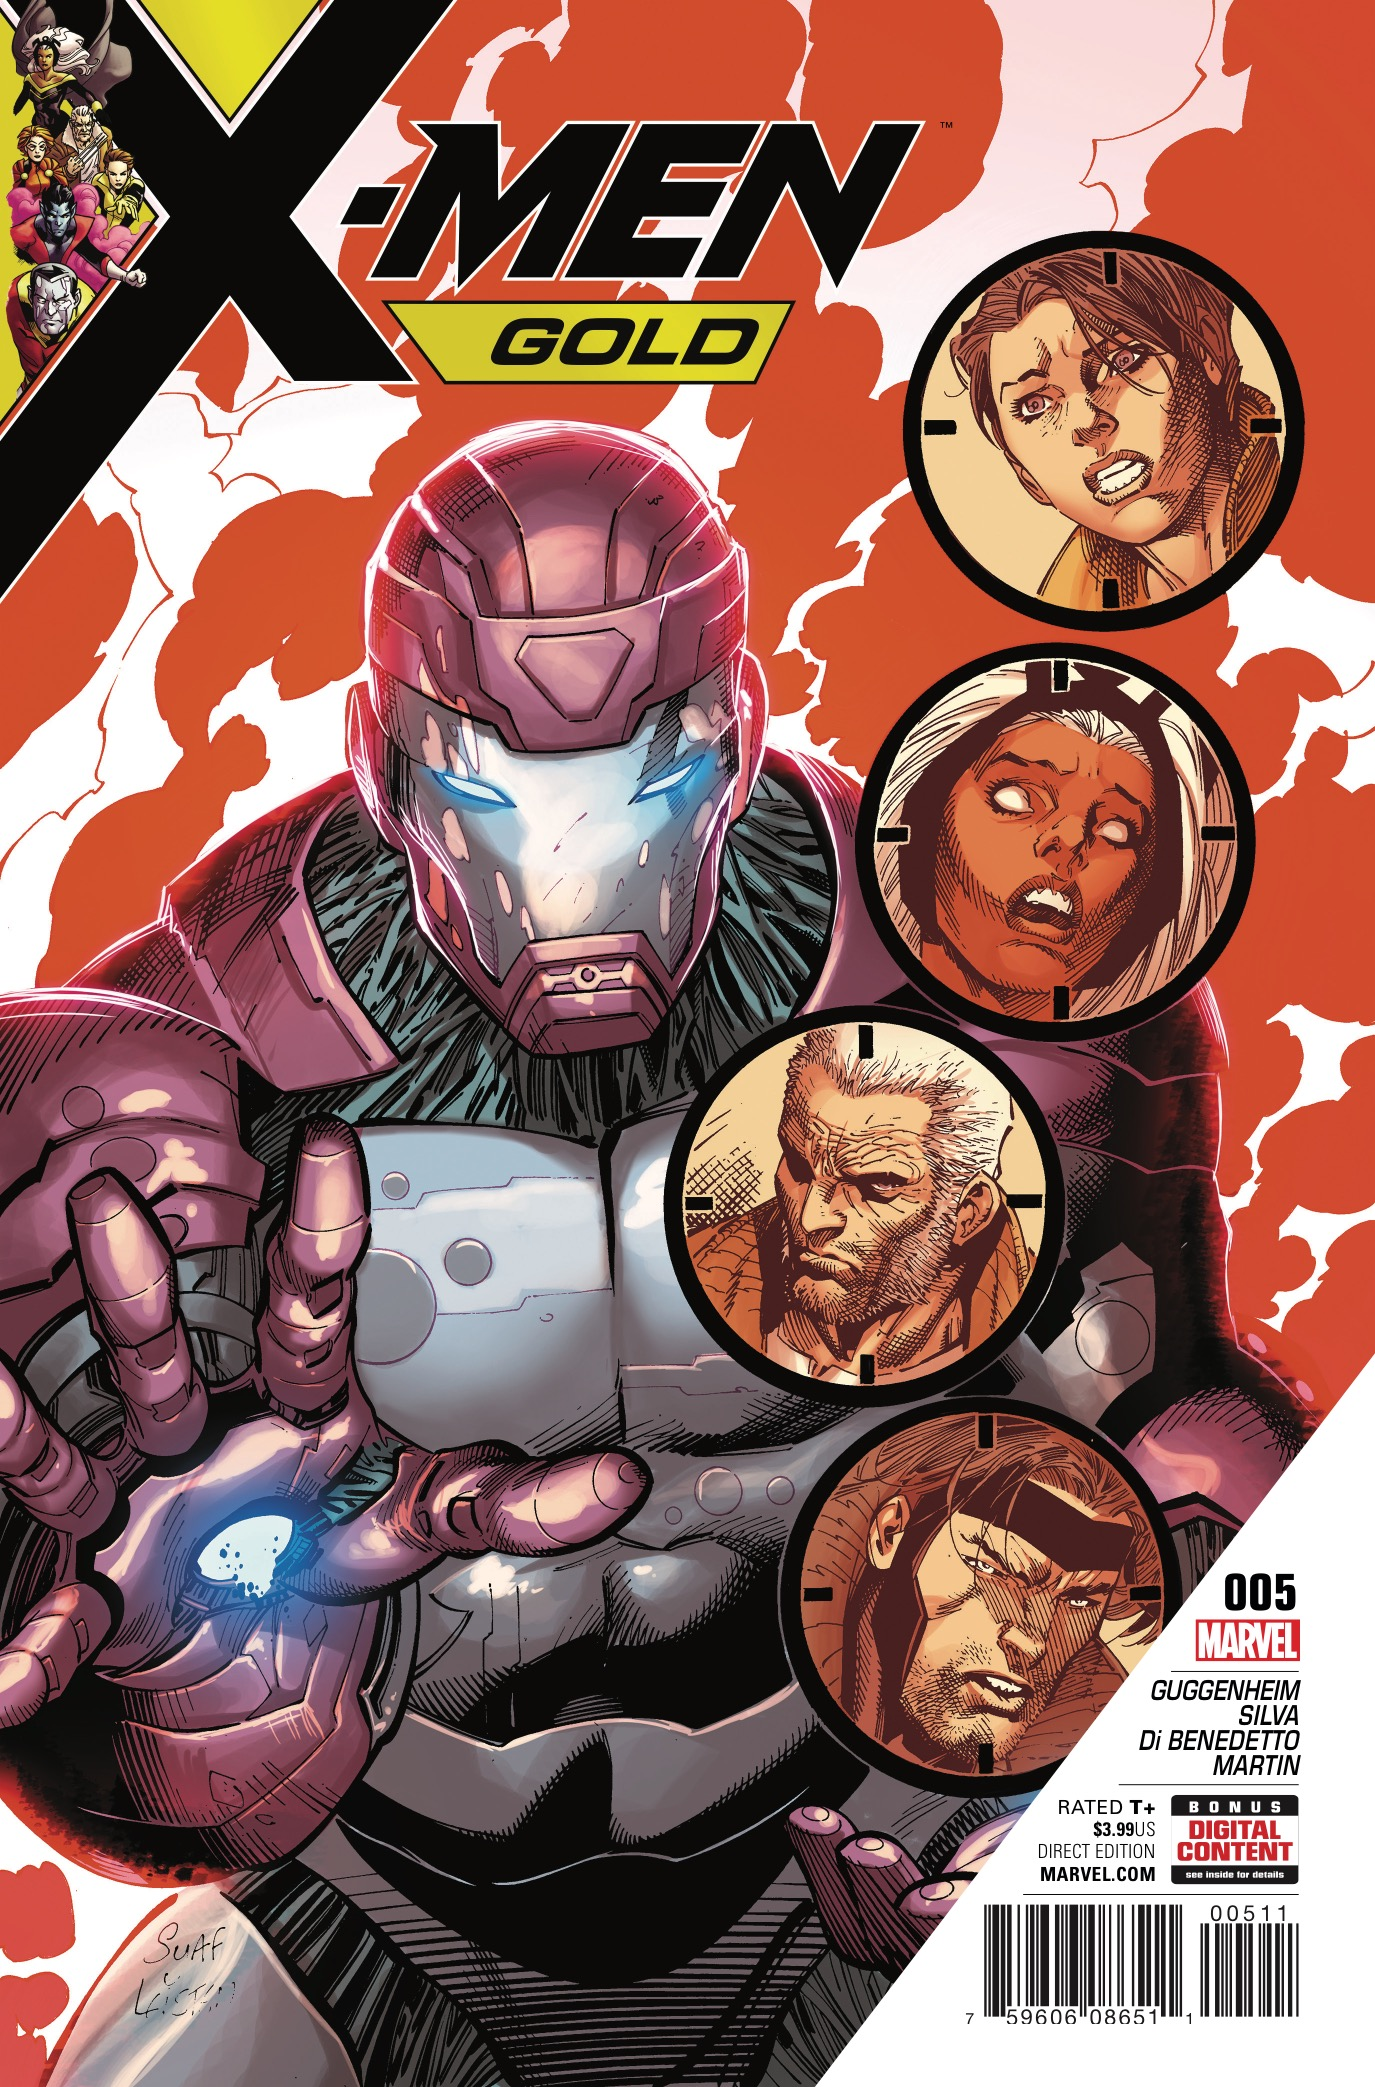 X-Men: Gold #5 Review